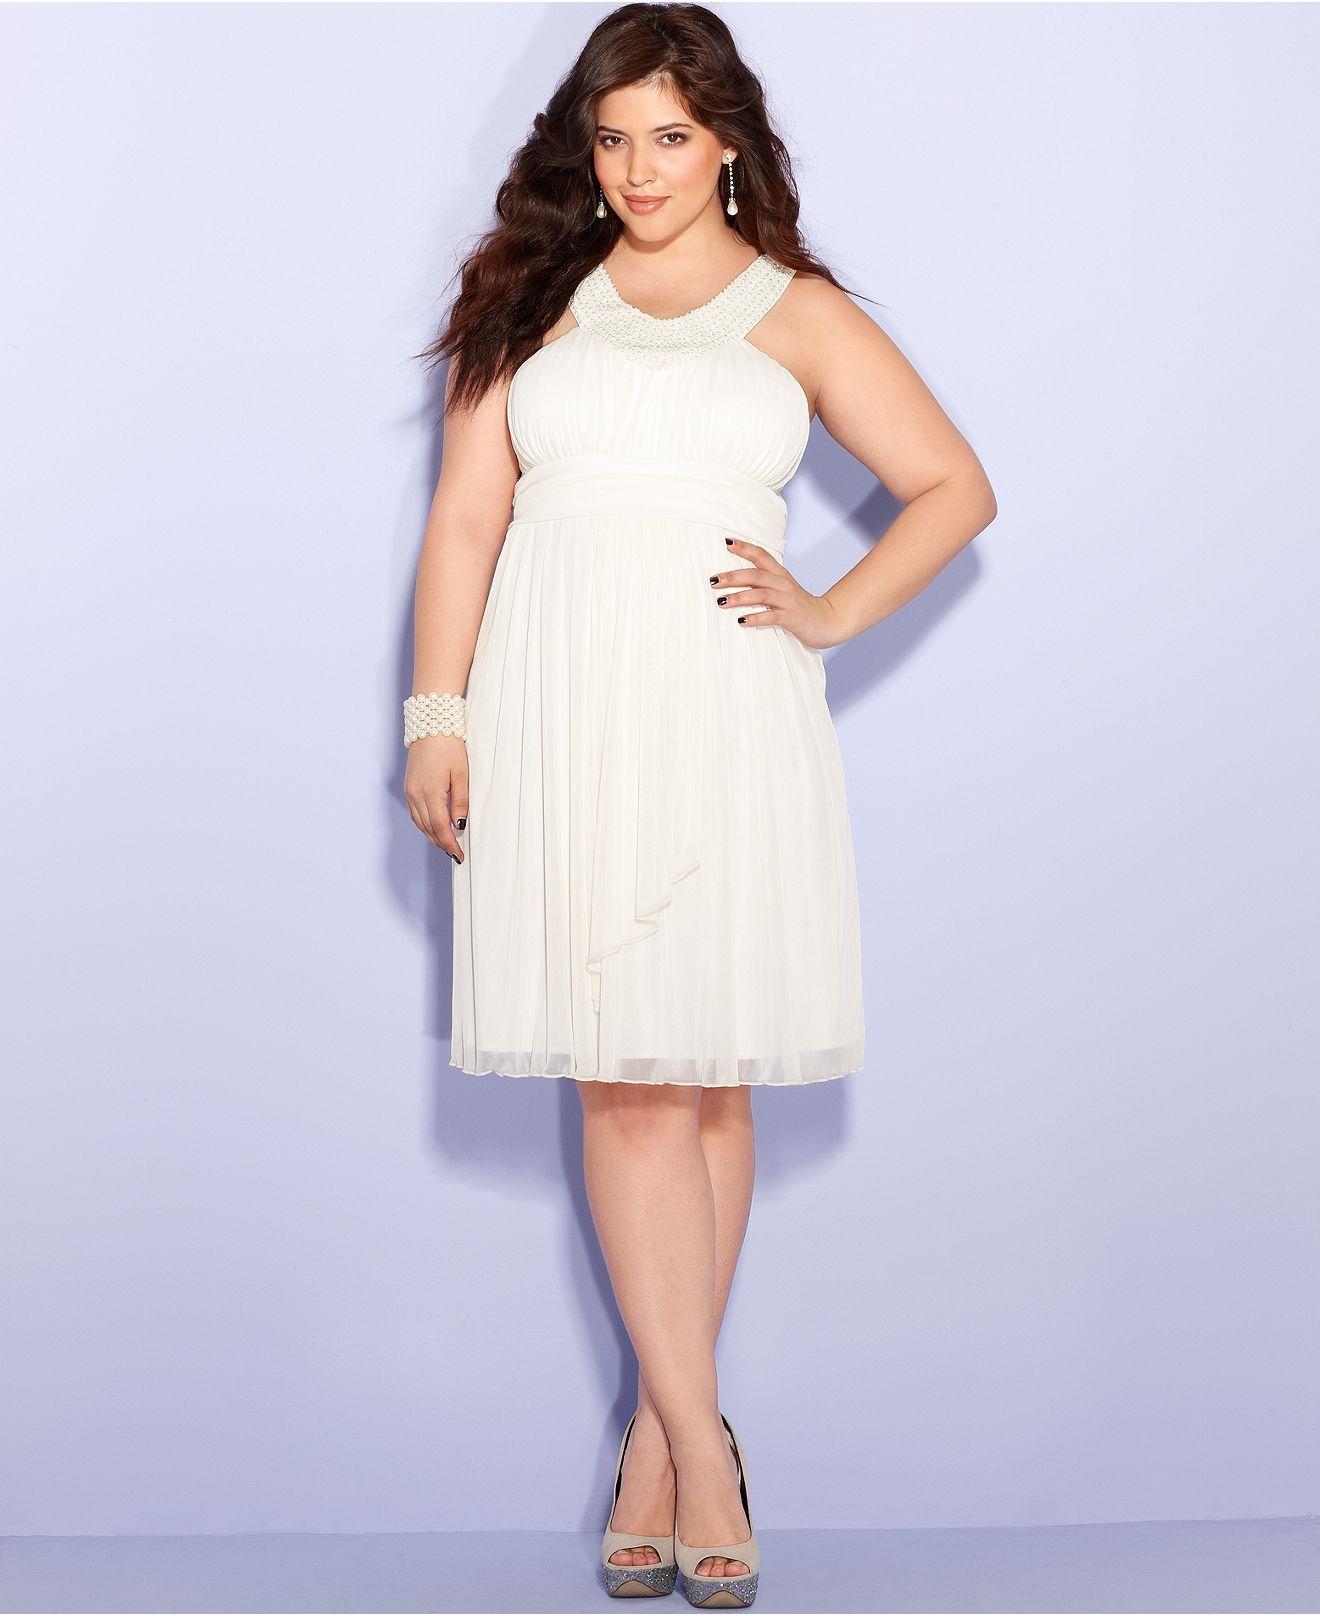 Plus Size White Dress Club Wear Plussize Outfit Dress Plus Size Dresses Plus Size Outfits White Dress [ 1616 x 1320 Pixel ]